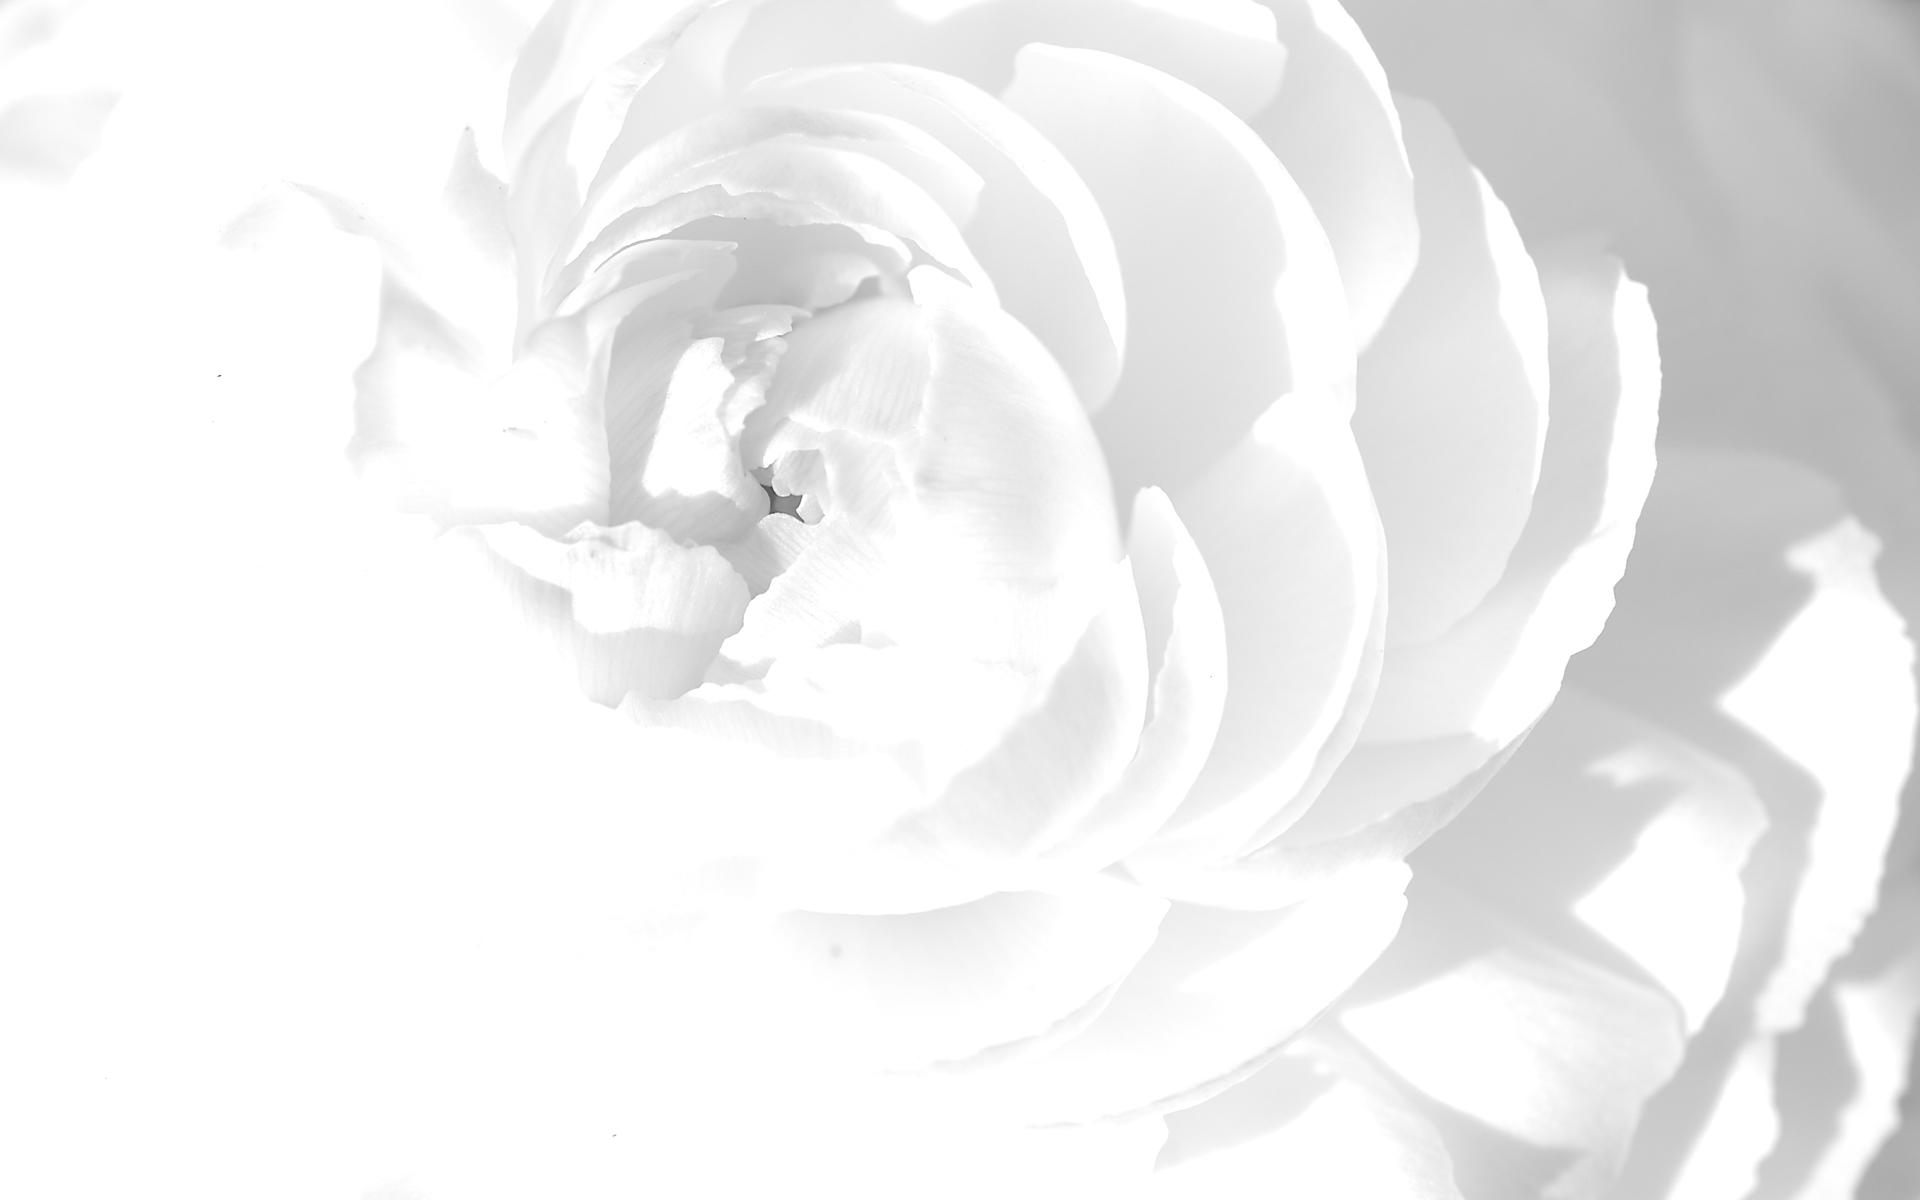 White background wallpaper hd wallpapersafari white wallpaper 9 dhlflorist Image collections